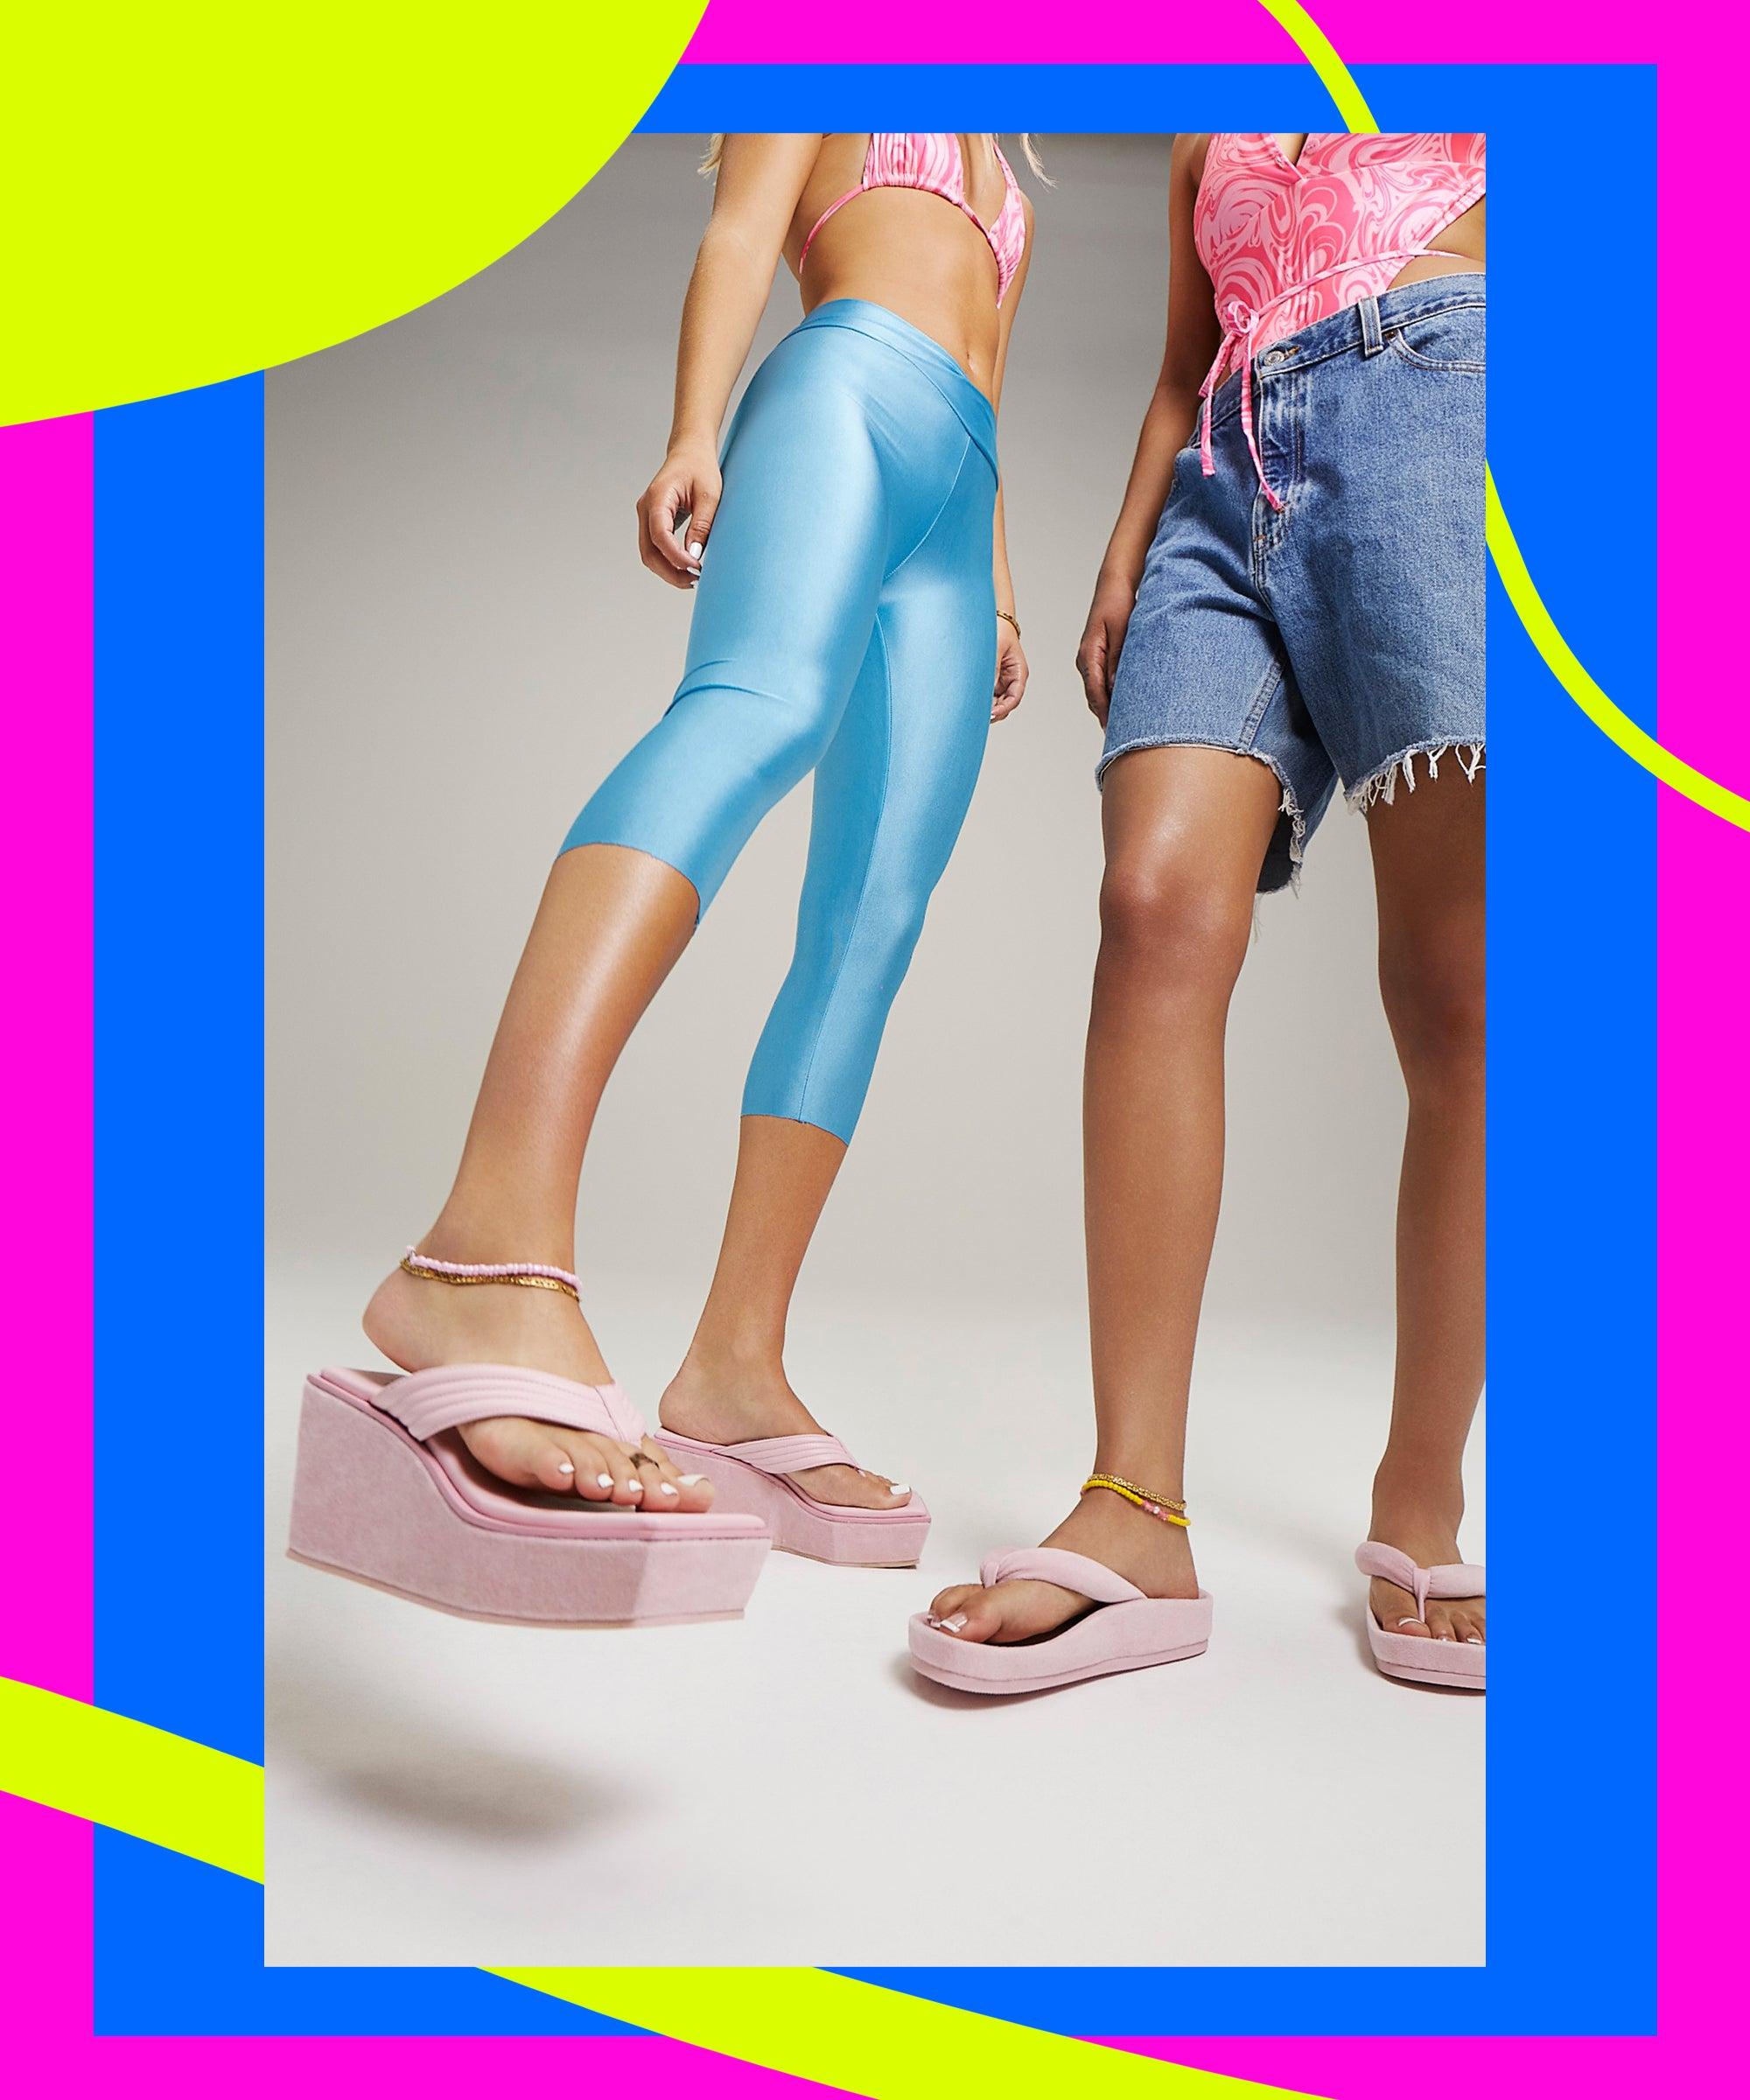 TikTok's Favorite Bikini Brand Just Launched A Y2K Shoe Line